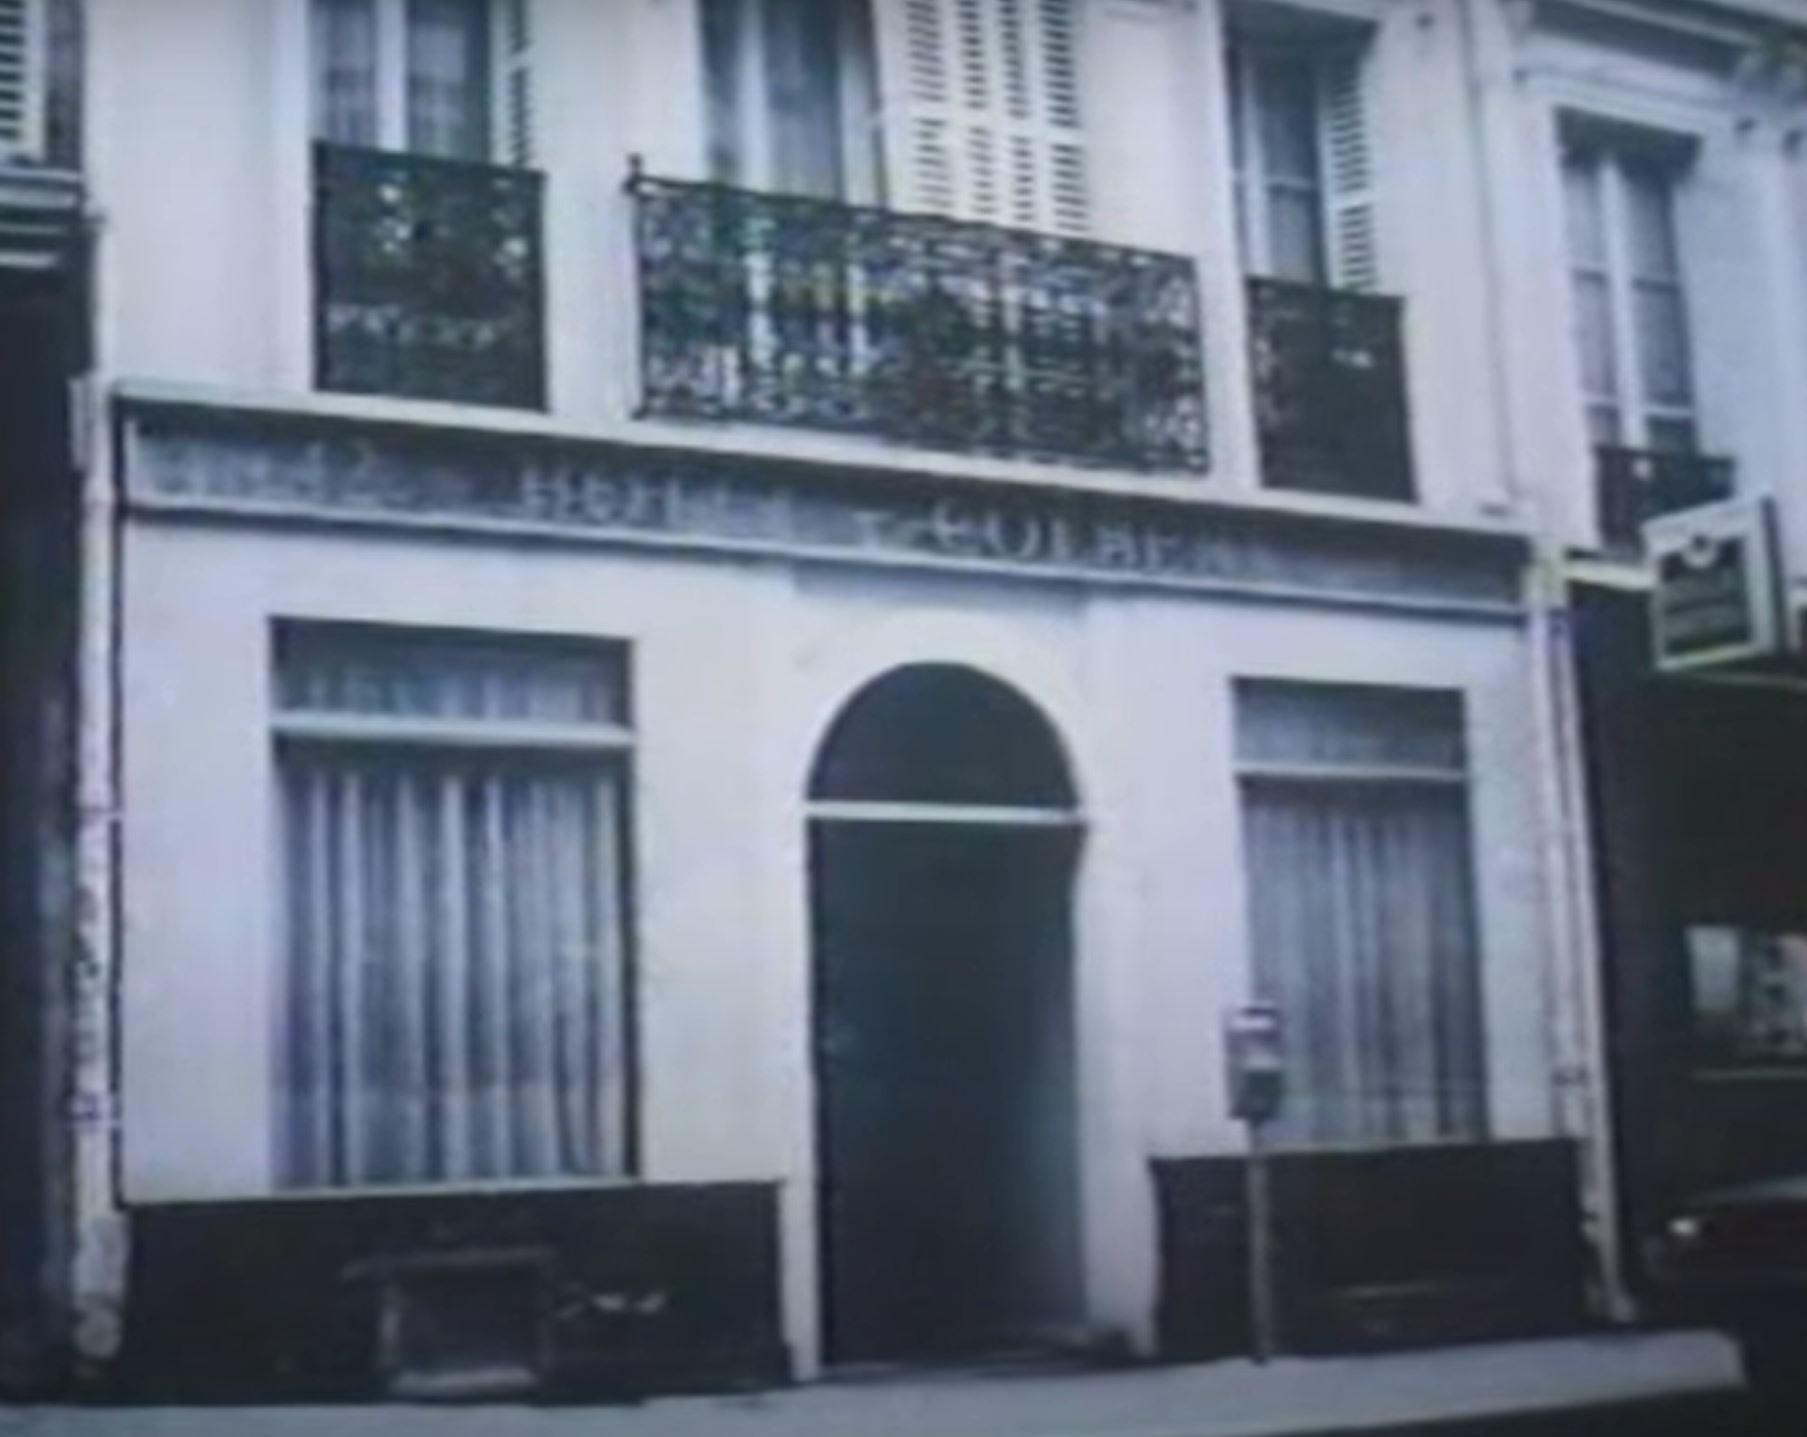 Hotel Colbert 42 rue de la Rochehoucault